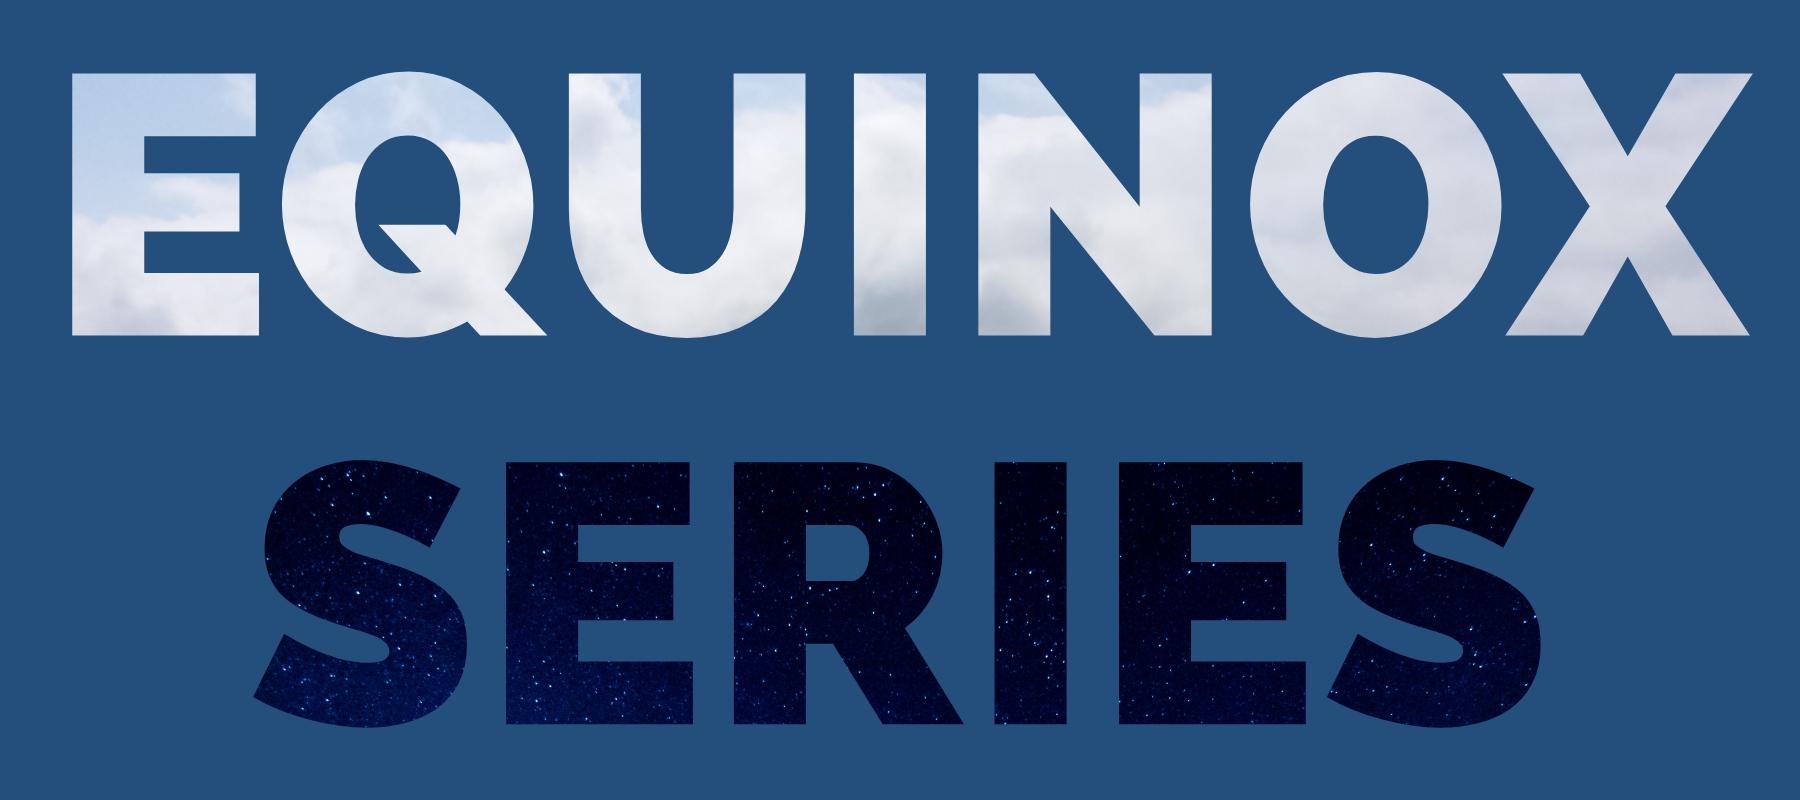 Equinox Series graphic